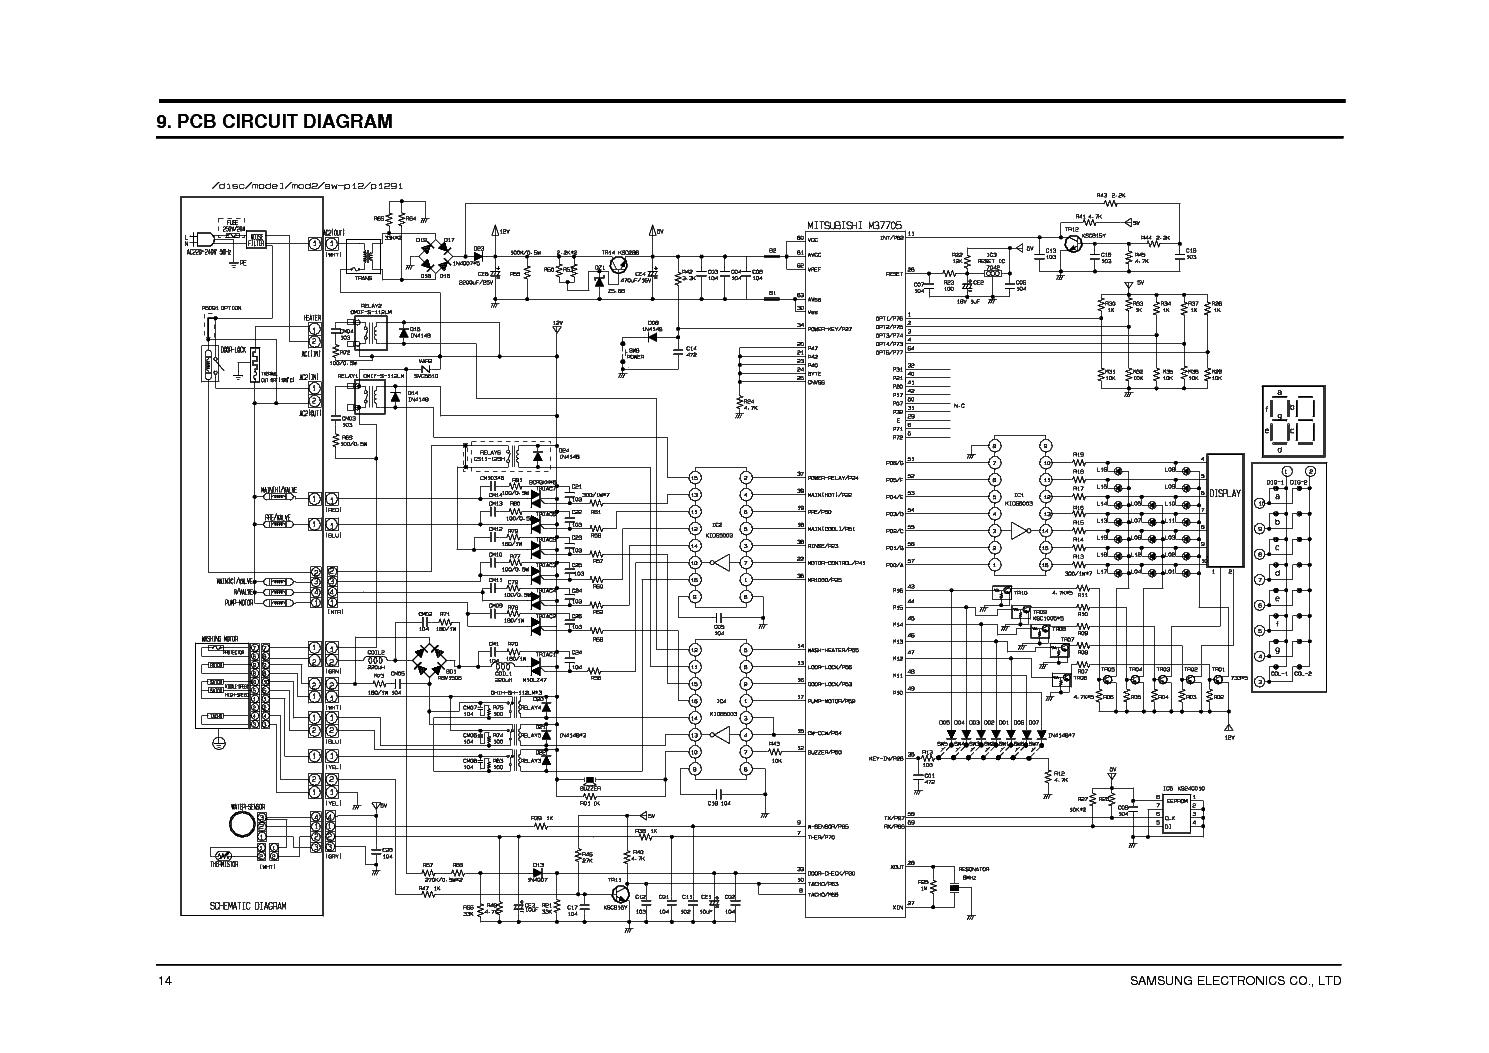 hight resolution of samsung washing machine circuit diagram wiring diagram data oreo whirlpool washing machine motor wiring diagram samsung